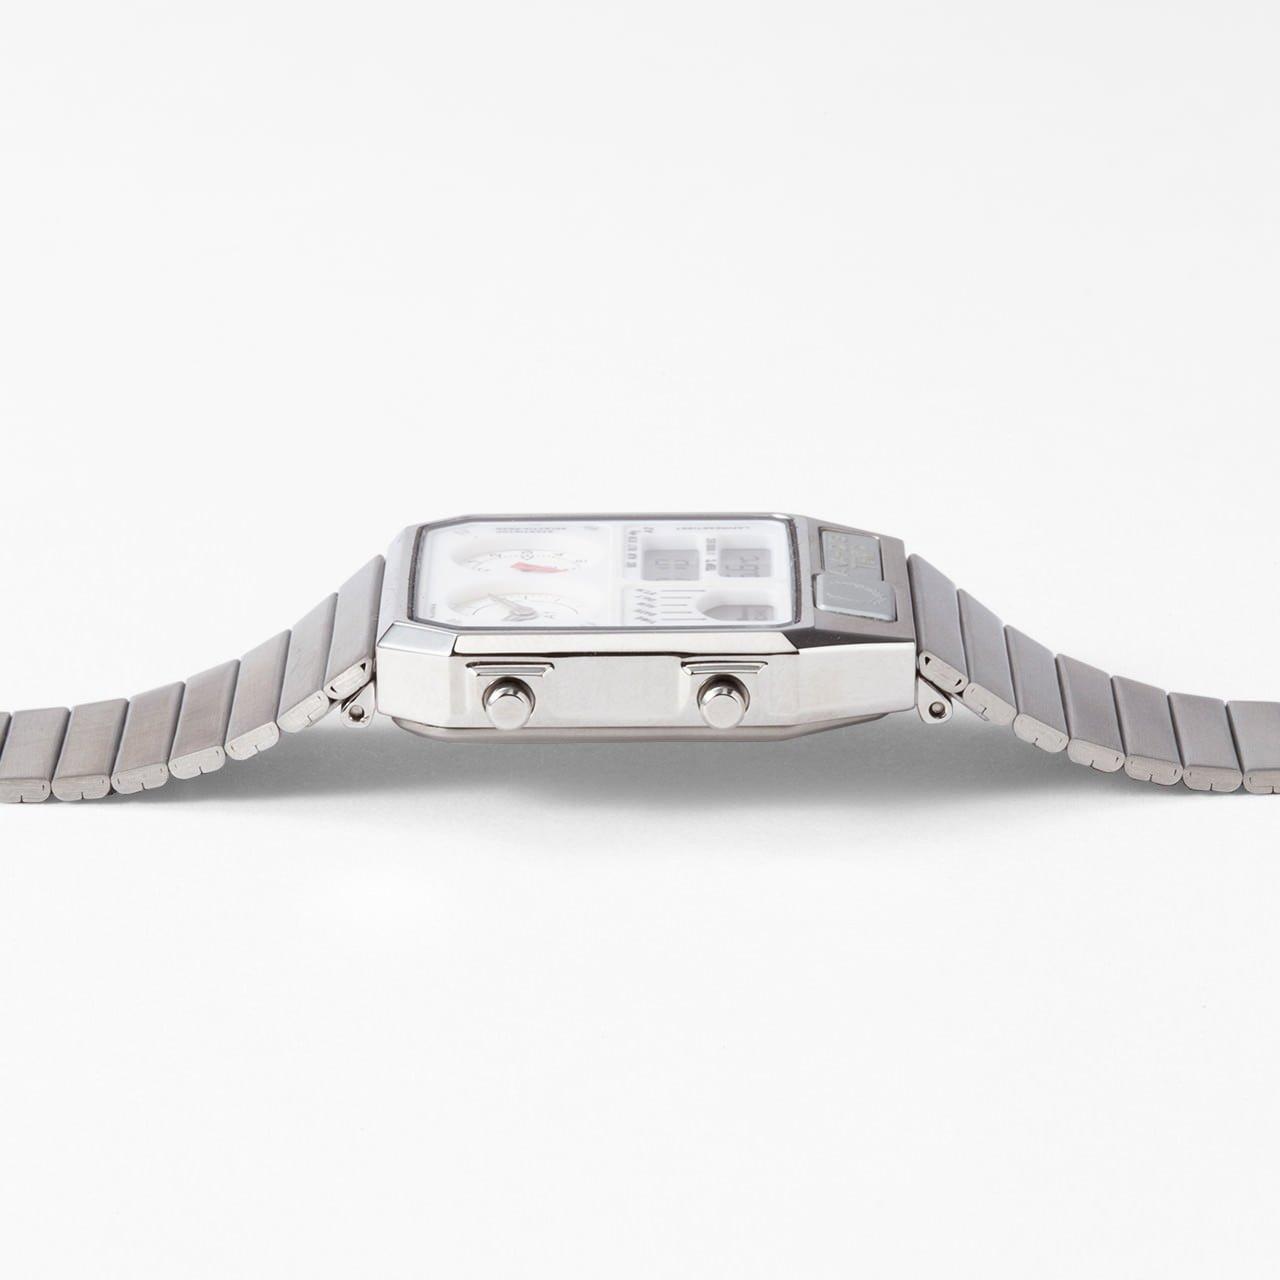 # ANA-DIGI TEMP for FRED PERRY 復刻經典星辰錶:復古與時尚的絕佳聯名 6